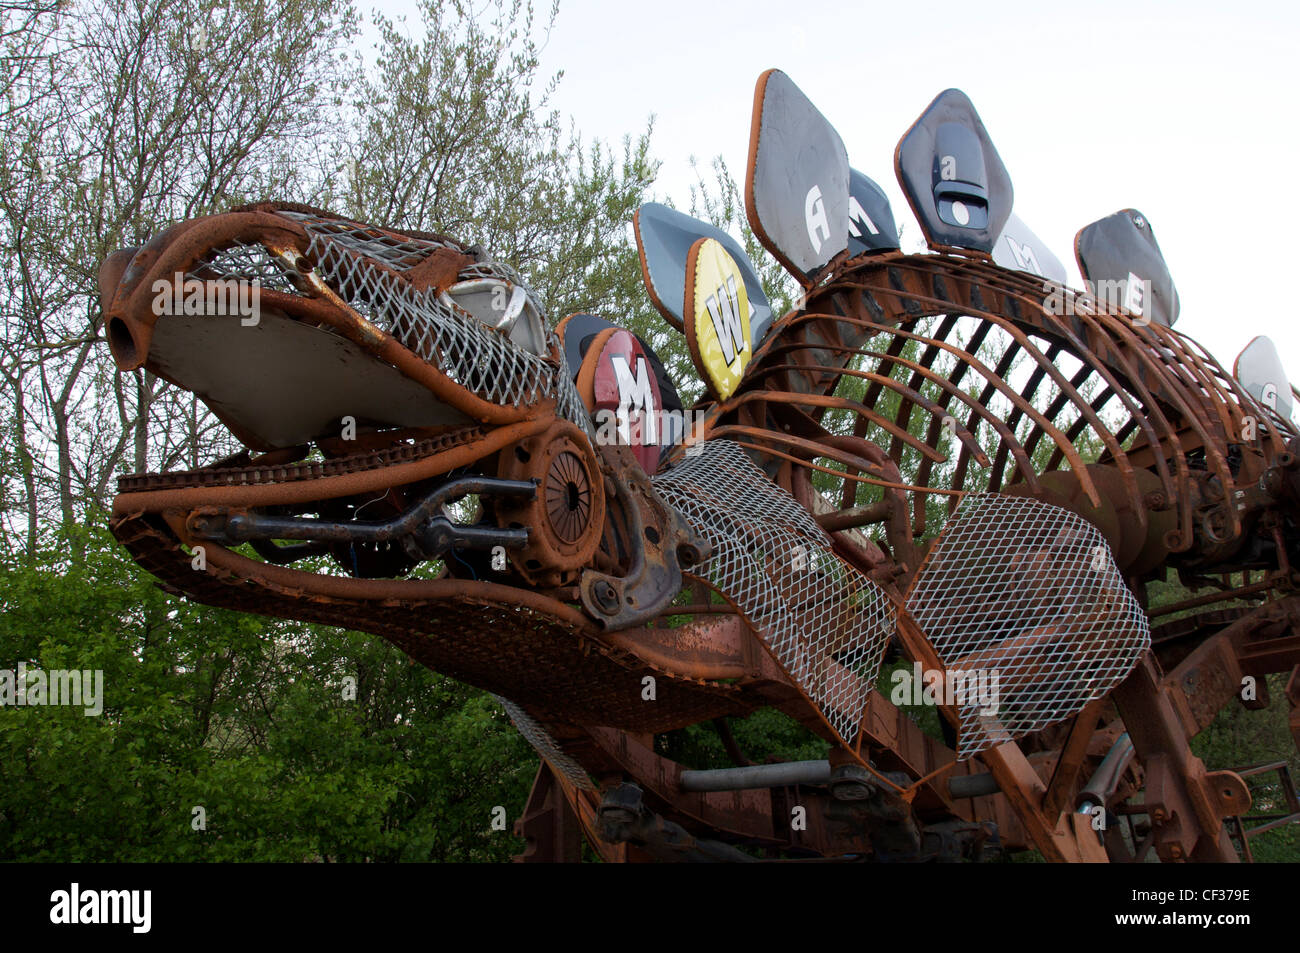 a life size sculpture representing a stegosaurus dinosaur created